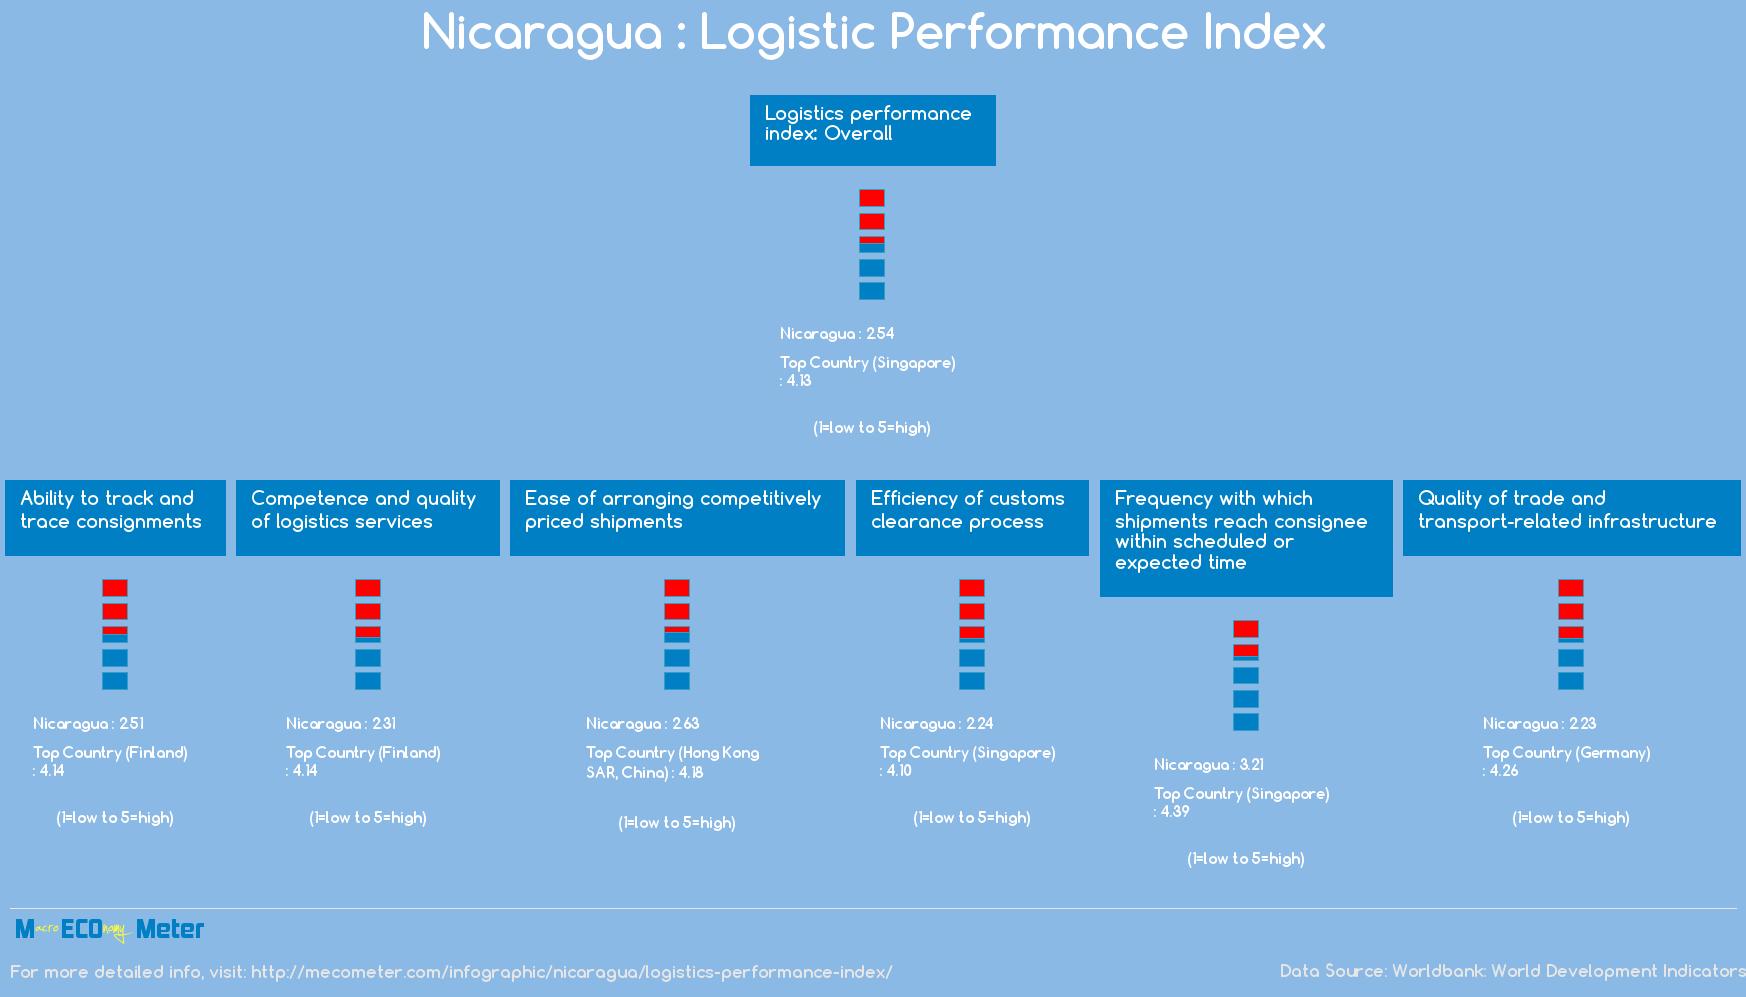 Nicaragua : Logistic Performance Index